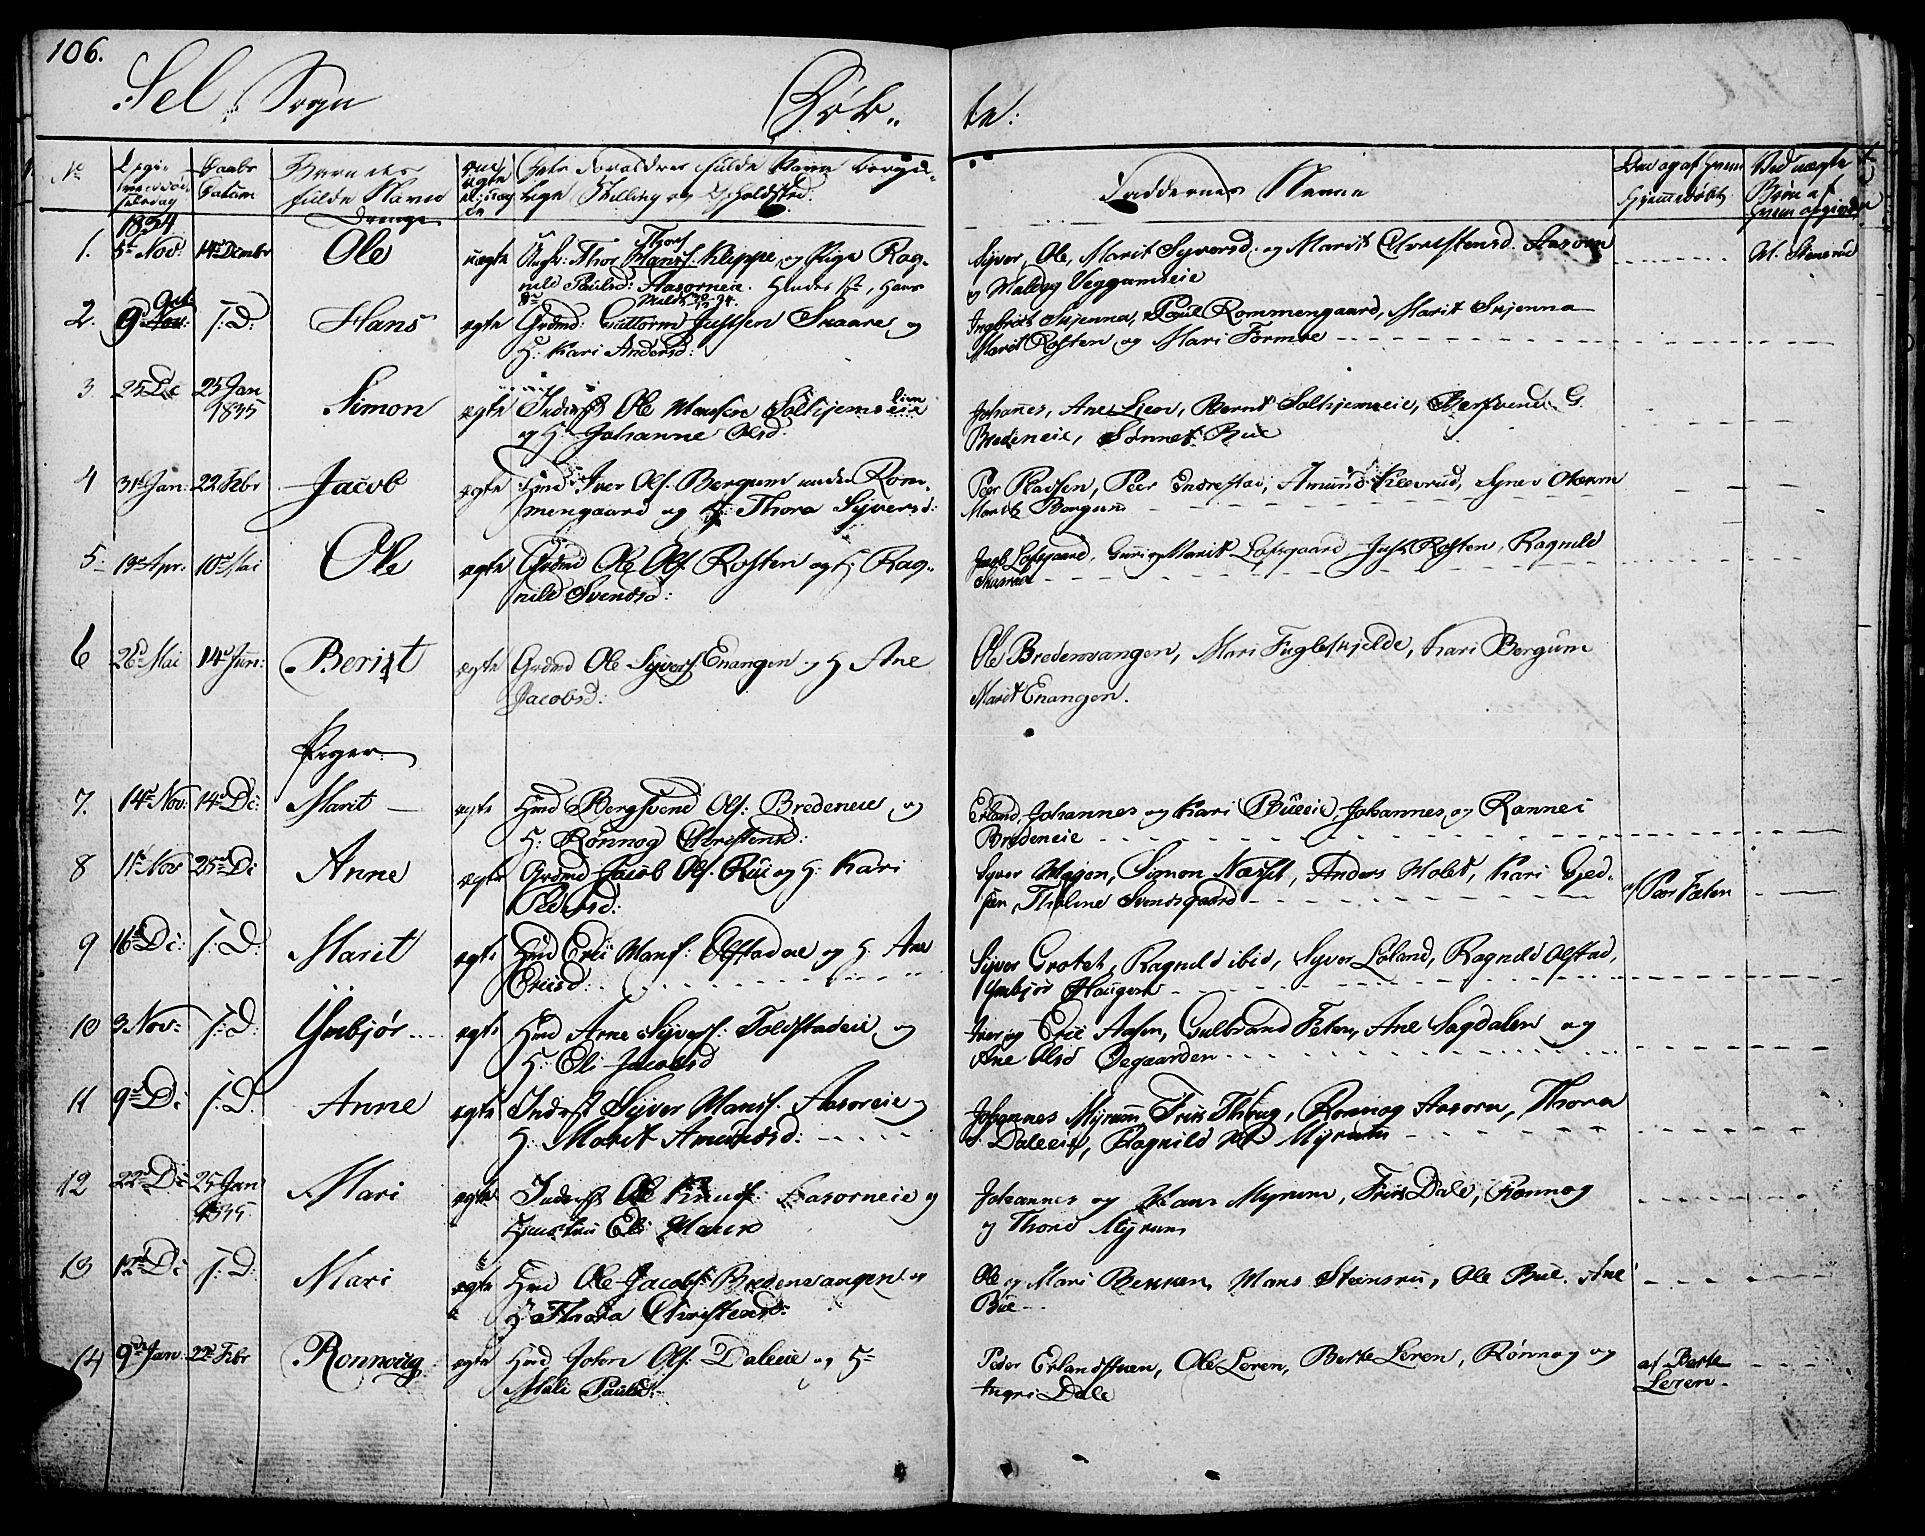 SAH, Vågå prestekontor, Ministerialbok nr. 4 /3, 1834-1842, s. 106